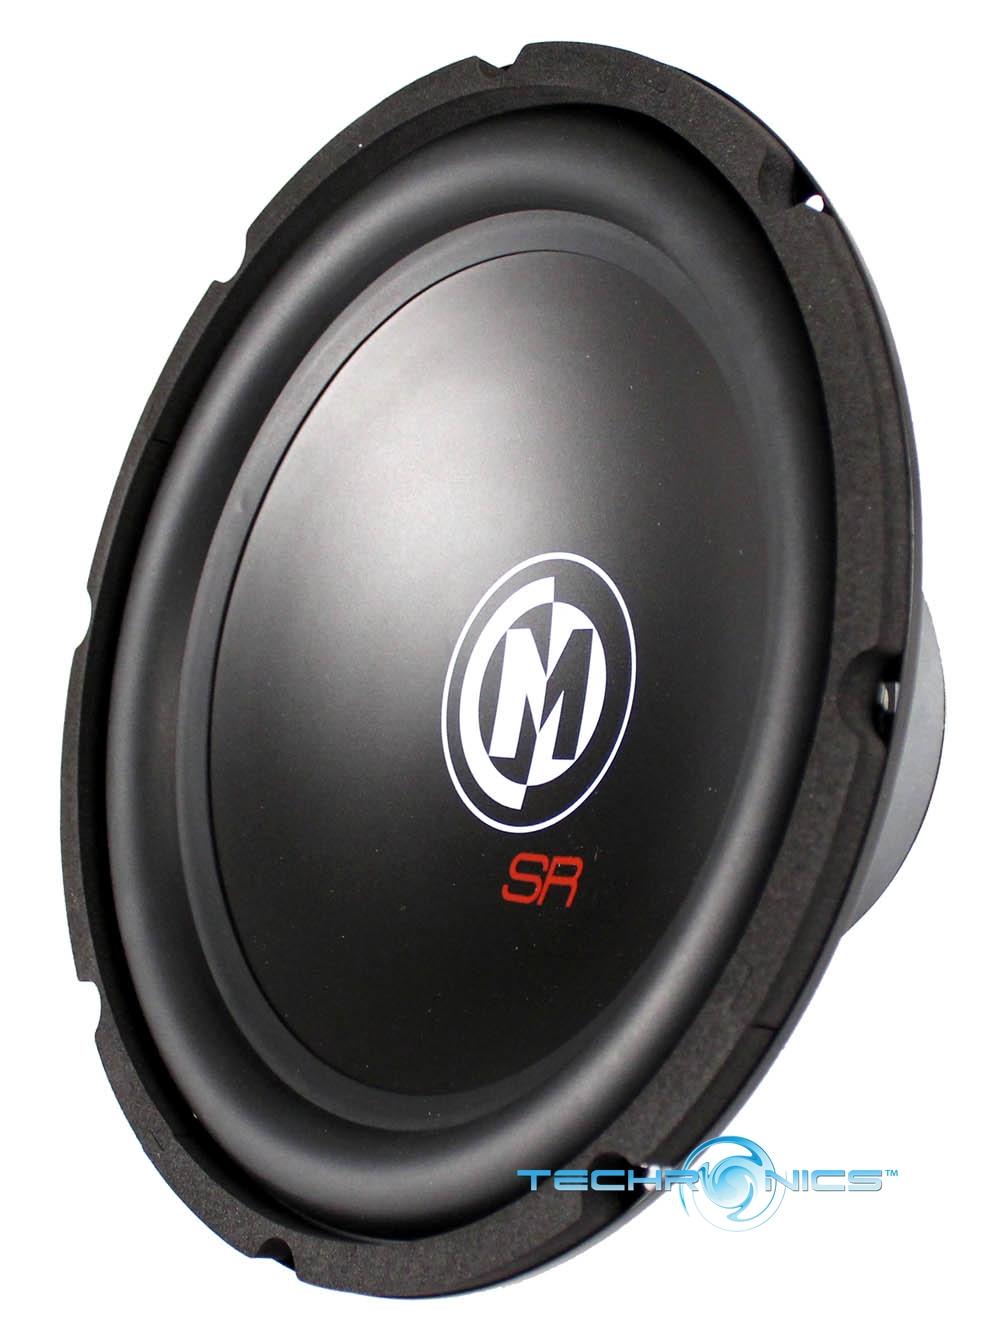 "MEMPHIS SR12S4 12"" STREET REFERENCE SERIES CAR AUDIO STEREO SUB WOOFER SPEAKER"